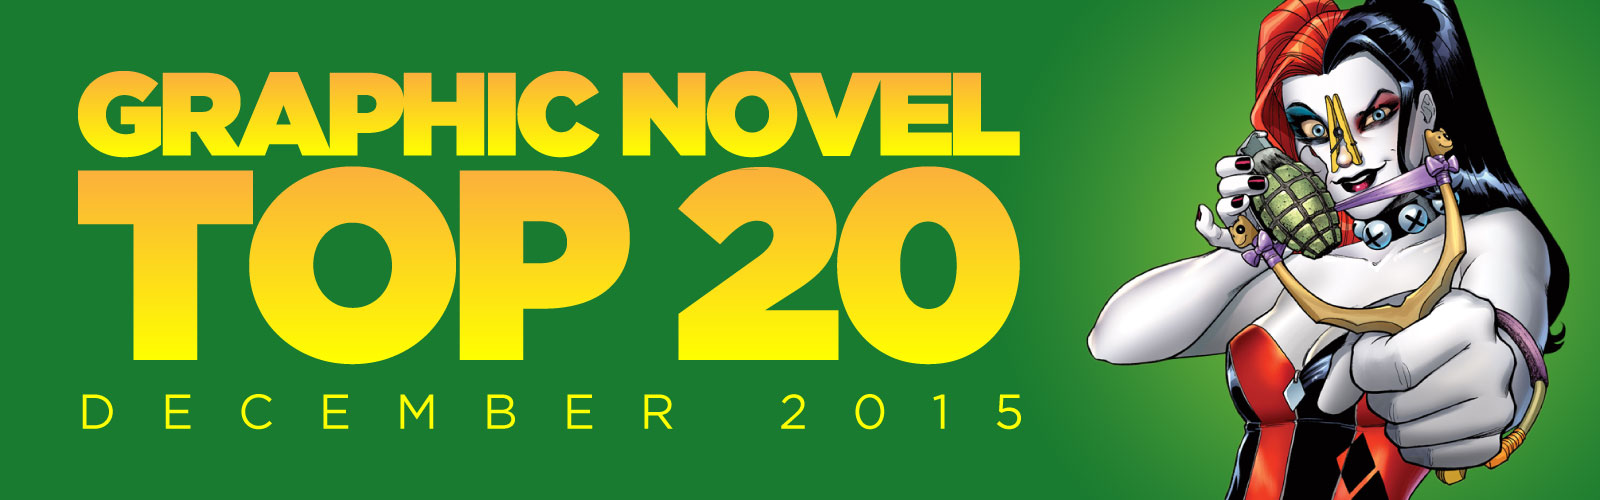 ACE Comics' Top 20 Graphic Novels Chart, December 2015